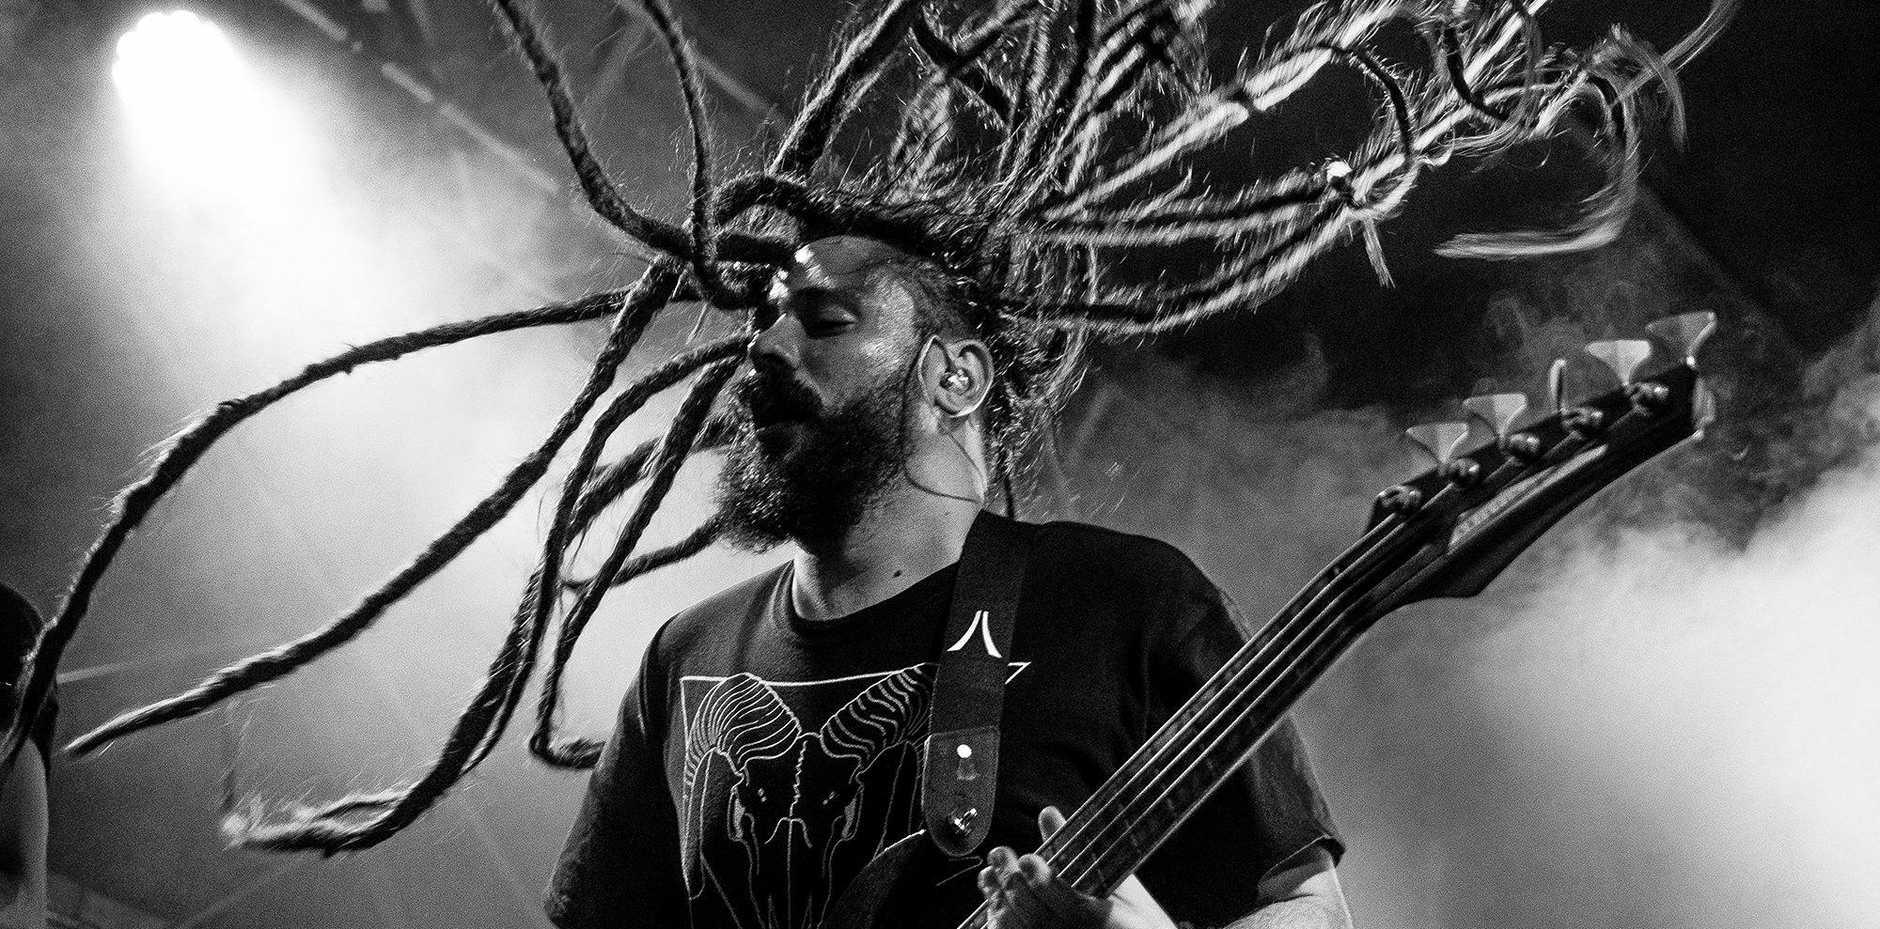 Brandon captured this hair-raising moment from Monuments bassist Adam Swan.